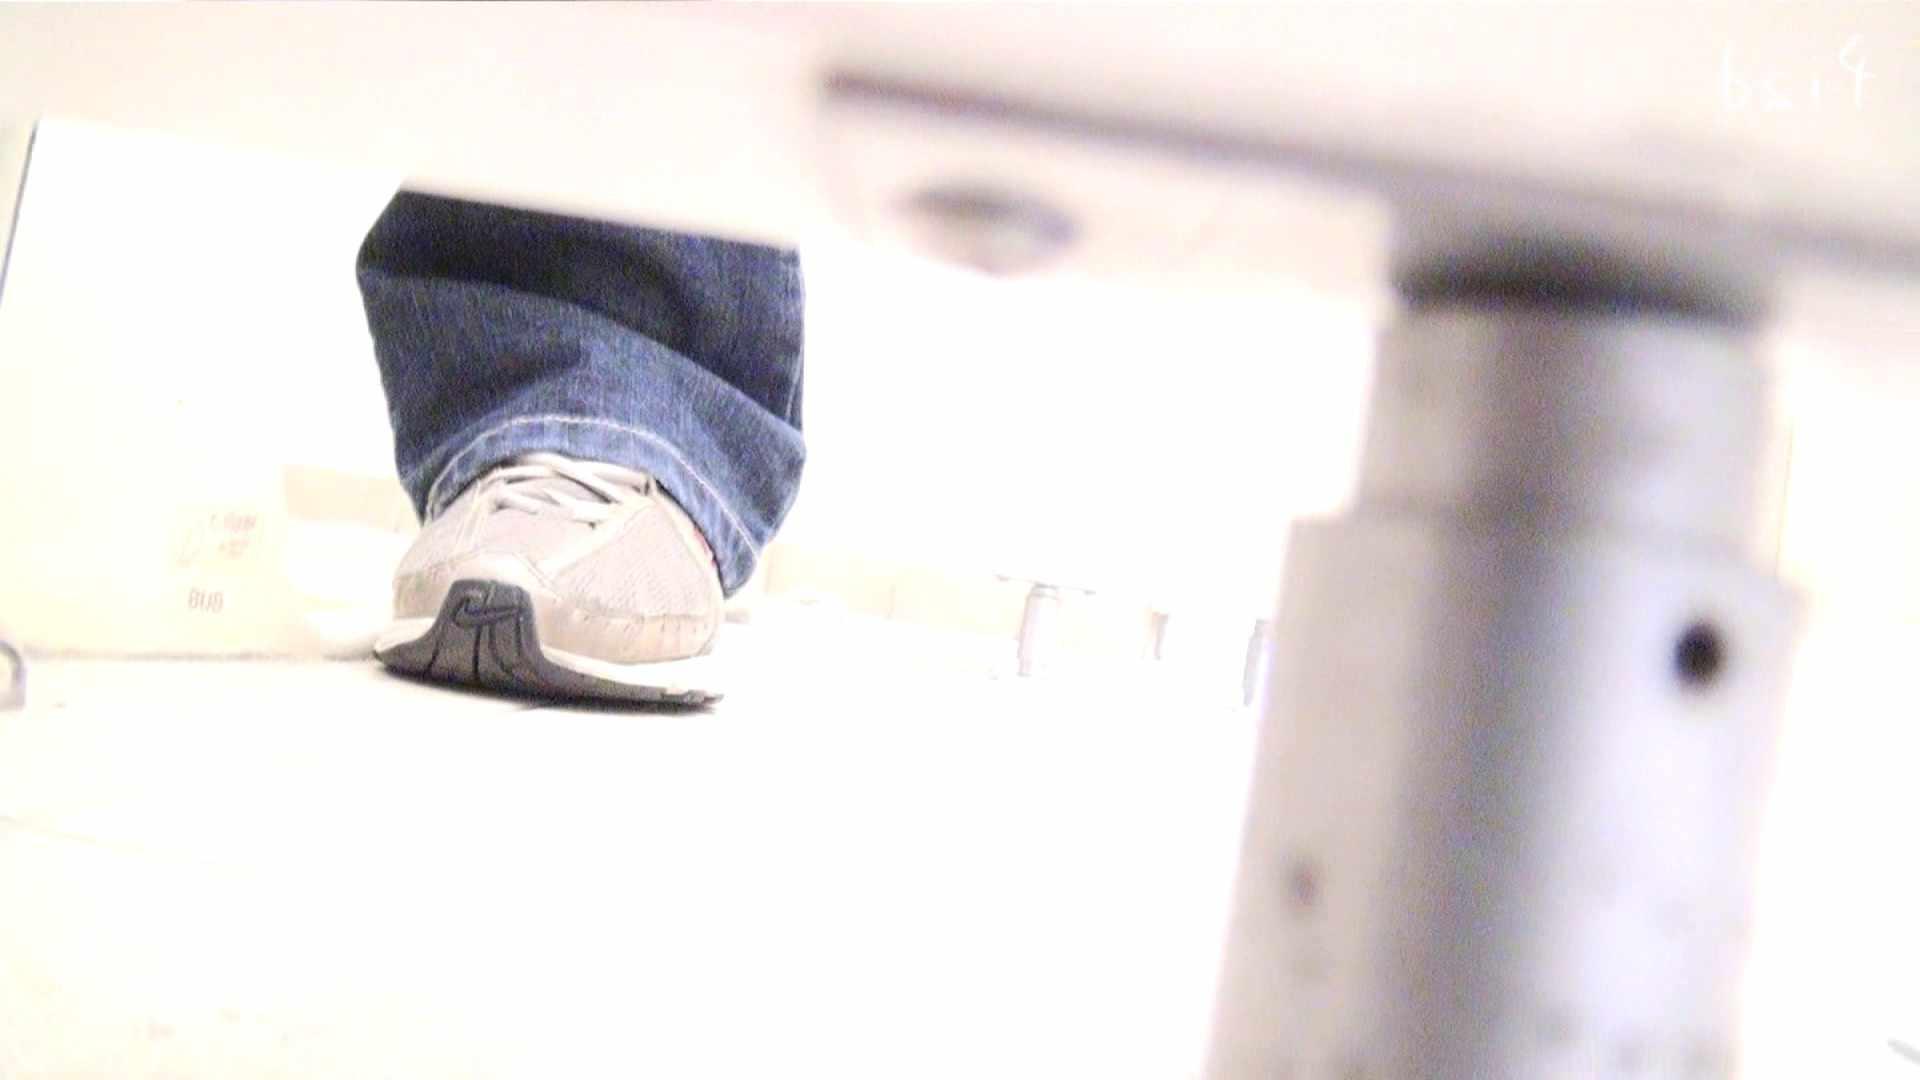 至高下半身盗撮-PREMIUM-【院内病棟編 】 vol.04 ナース ワレメ動画紹介 71PIX 59